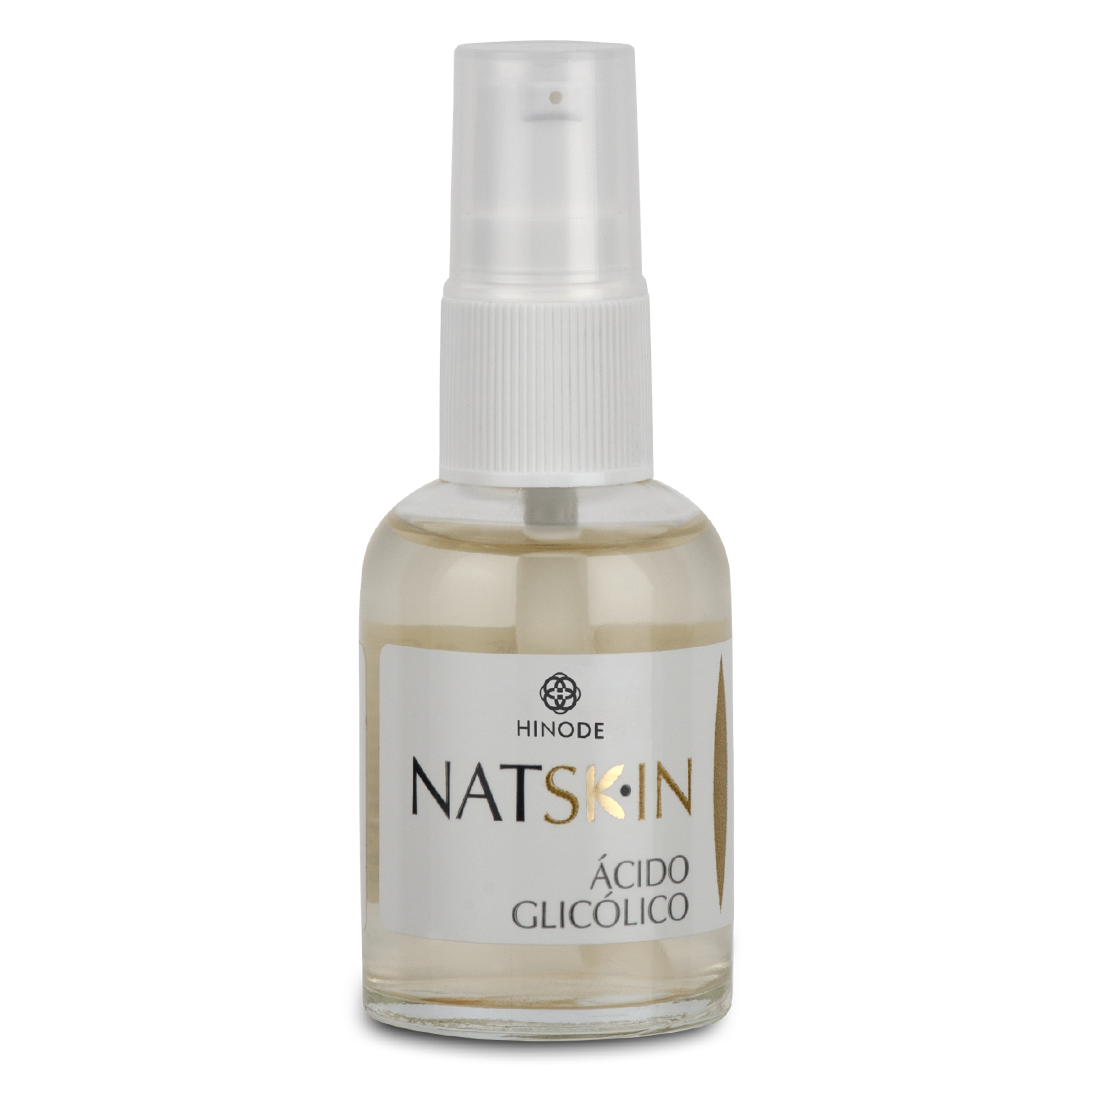 Natskin – Glycolic Acid Chemical Scrub – 30 ml